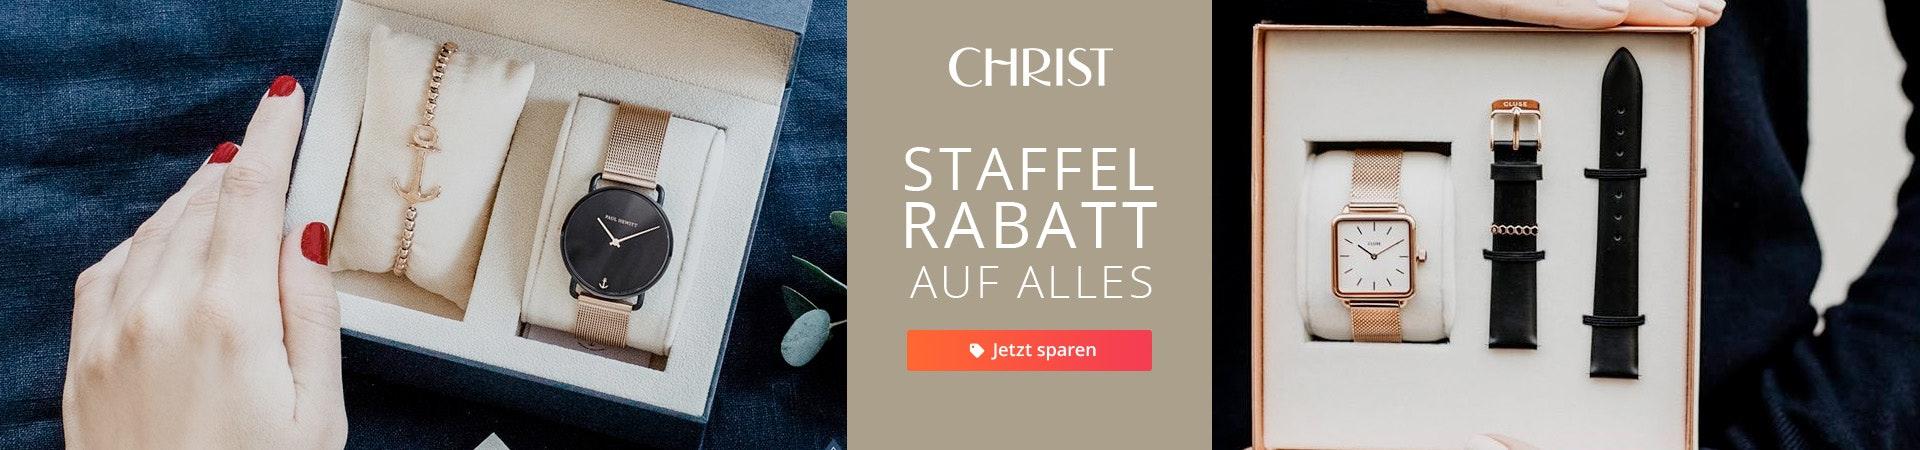 christ staffelrabatt